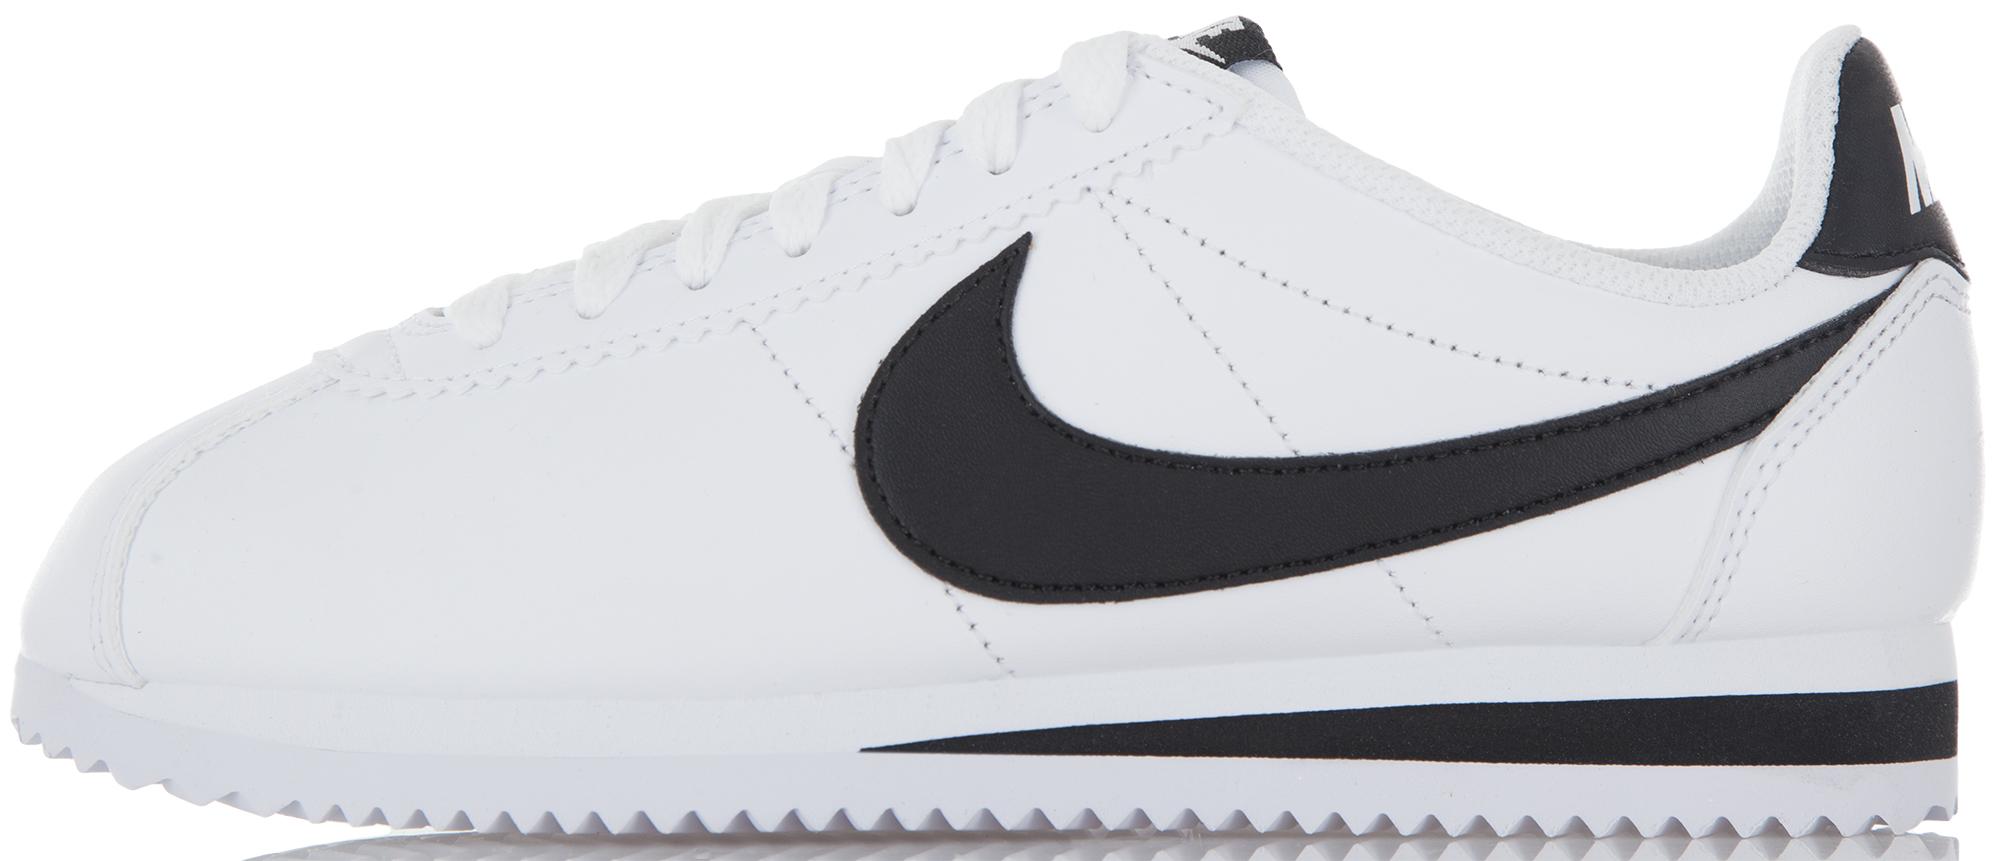 Nike Кроссовки женские Nike Classic Cortez Leather, размер 37,5